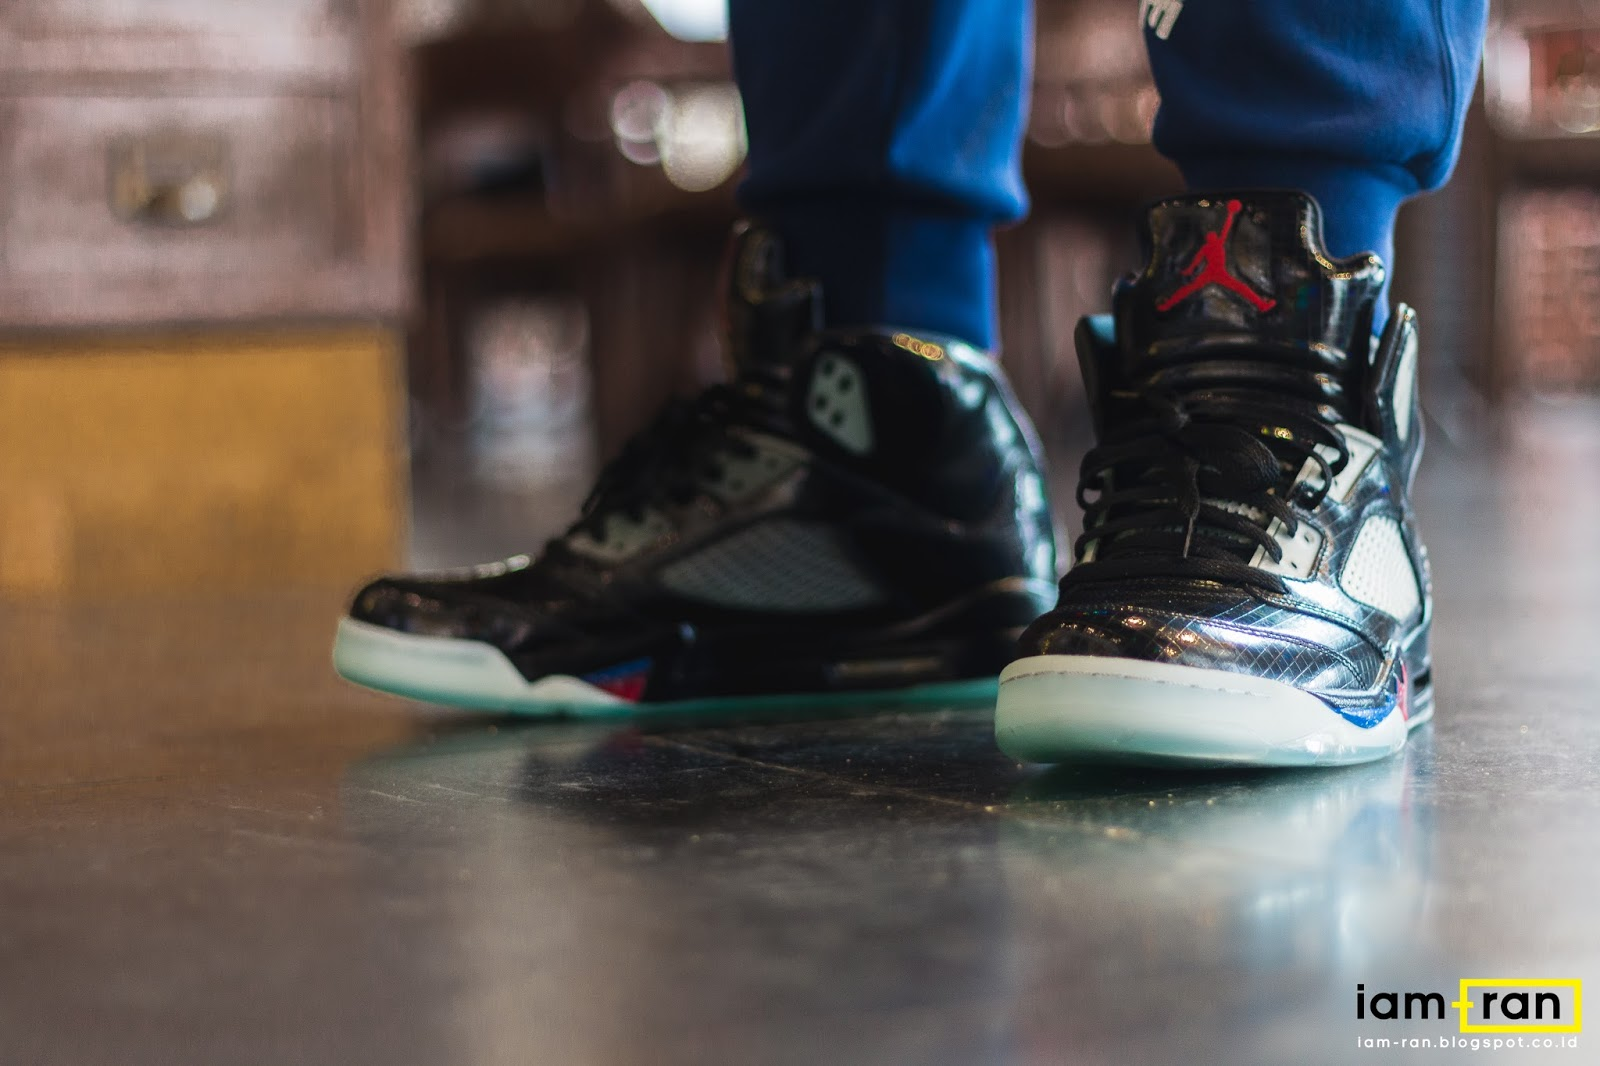 finest selection 3b1b9 d30ef IAM-RAN: ON FEET : Winston - Nike Air Jordan 5 X Mark Wahlberg X ...